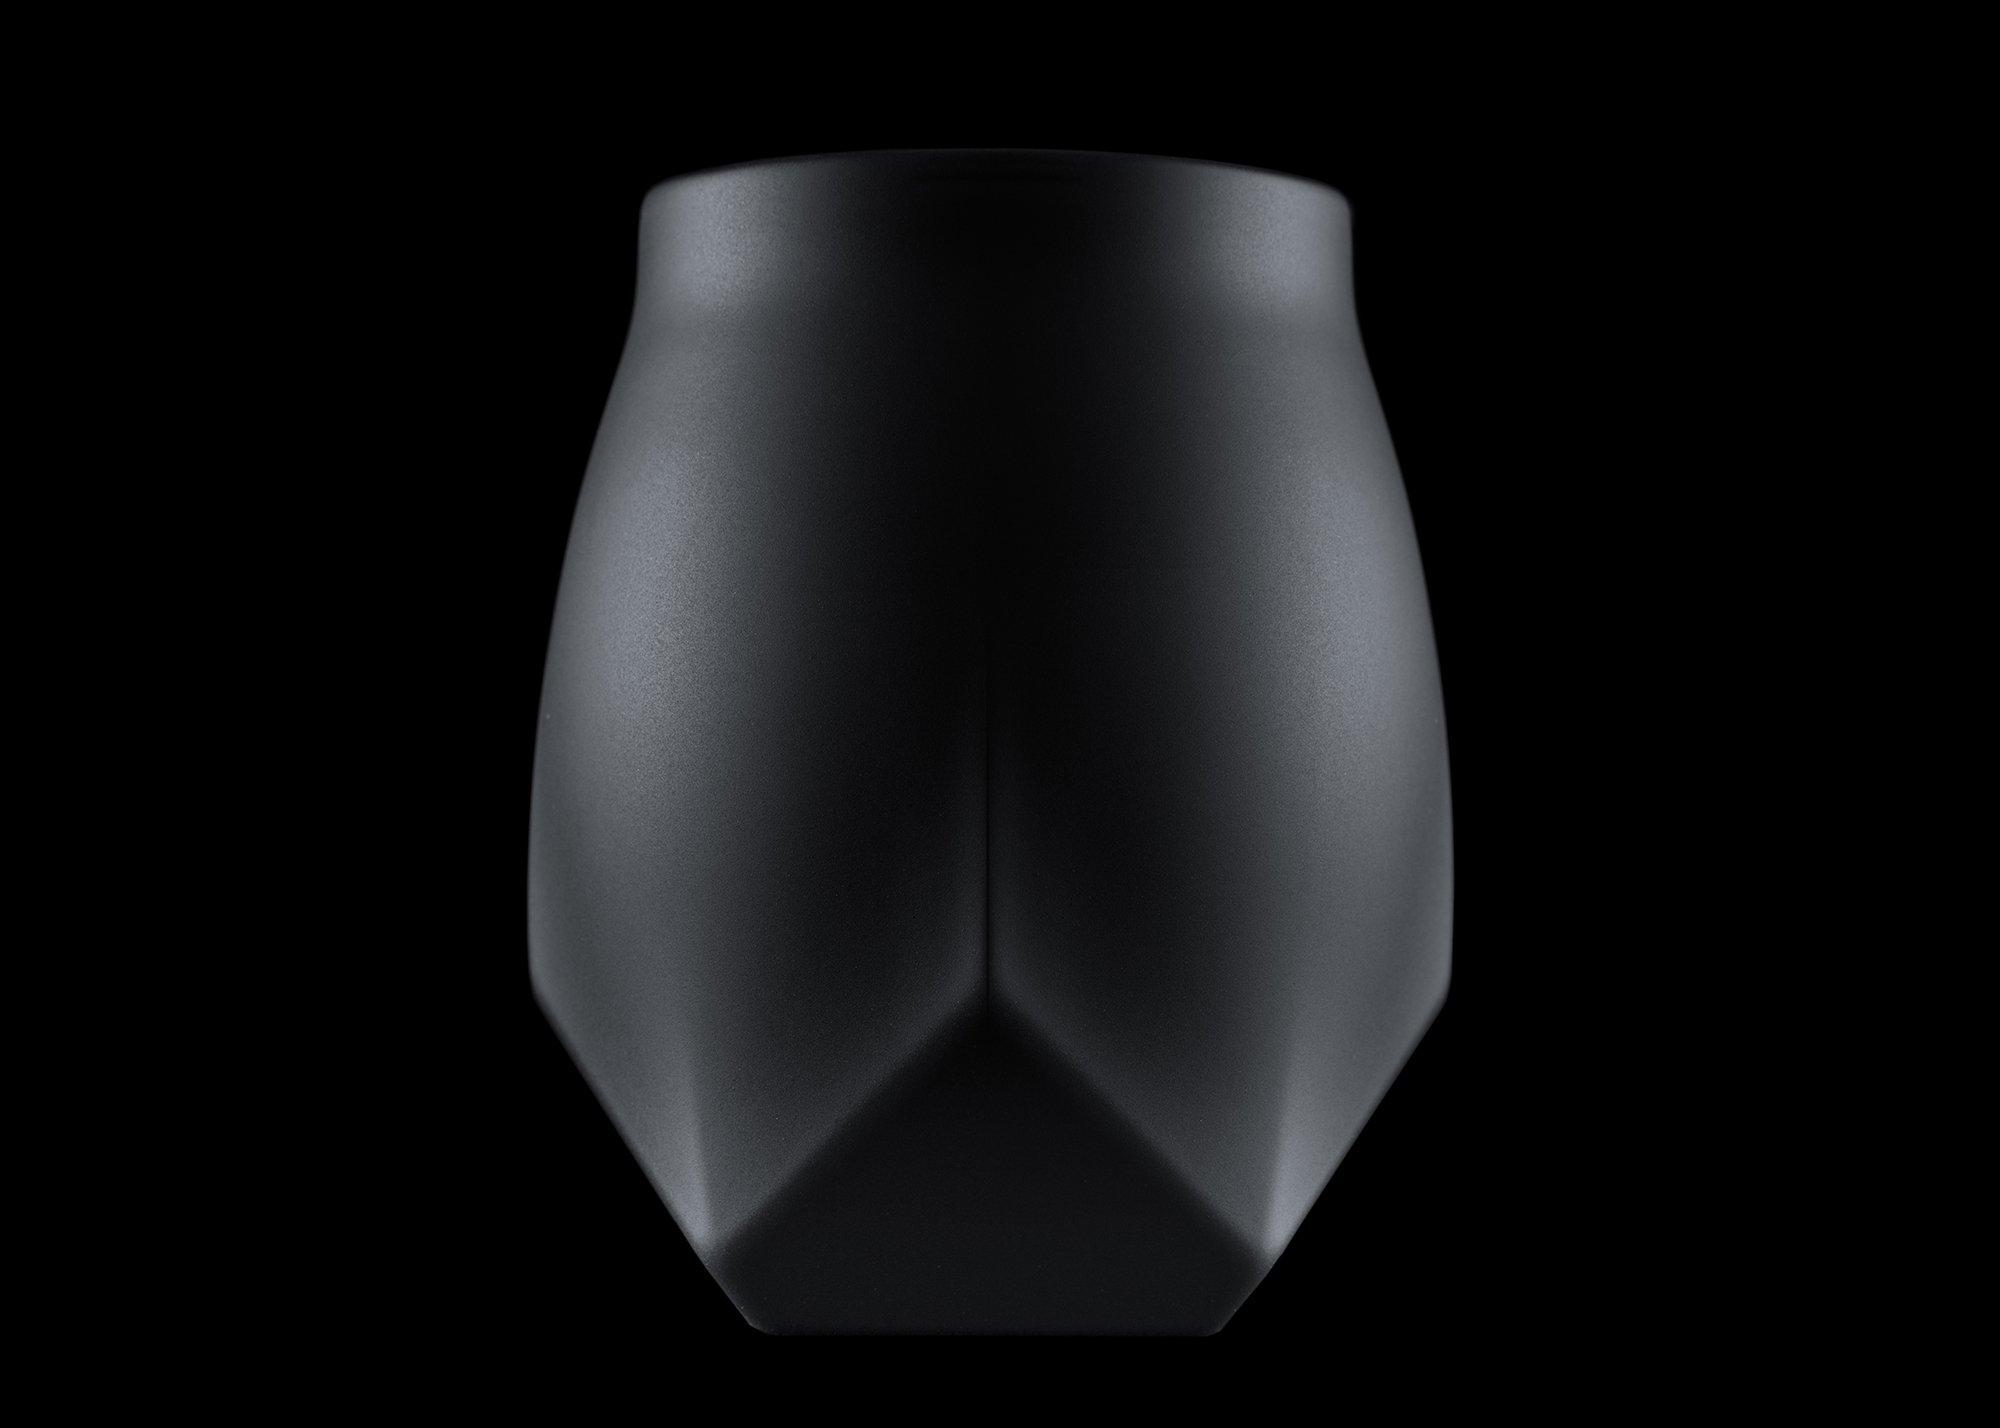 Norlan-Whisky-Glass-Black-Front.jpg